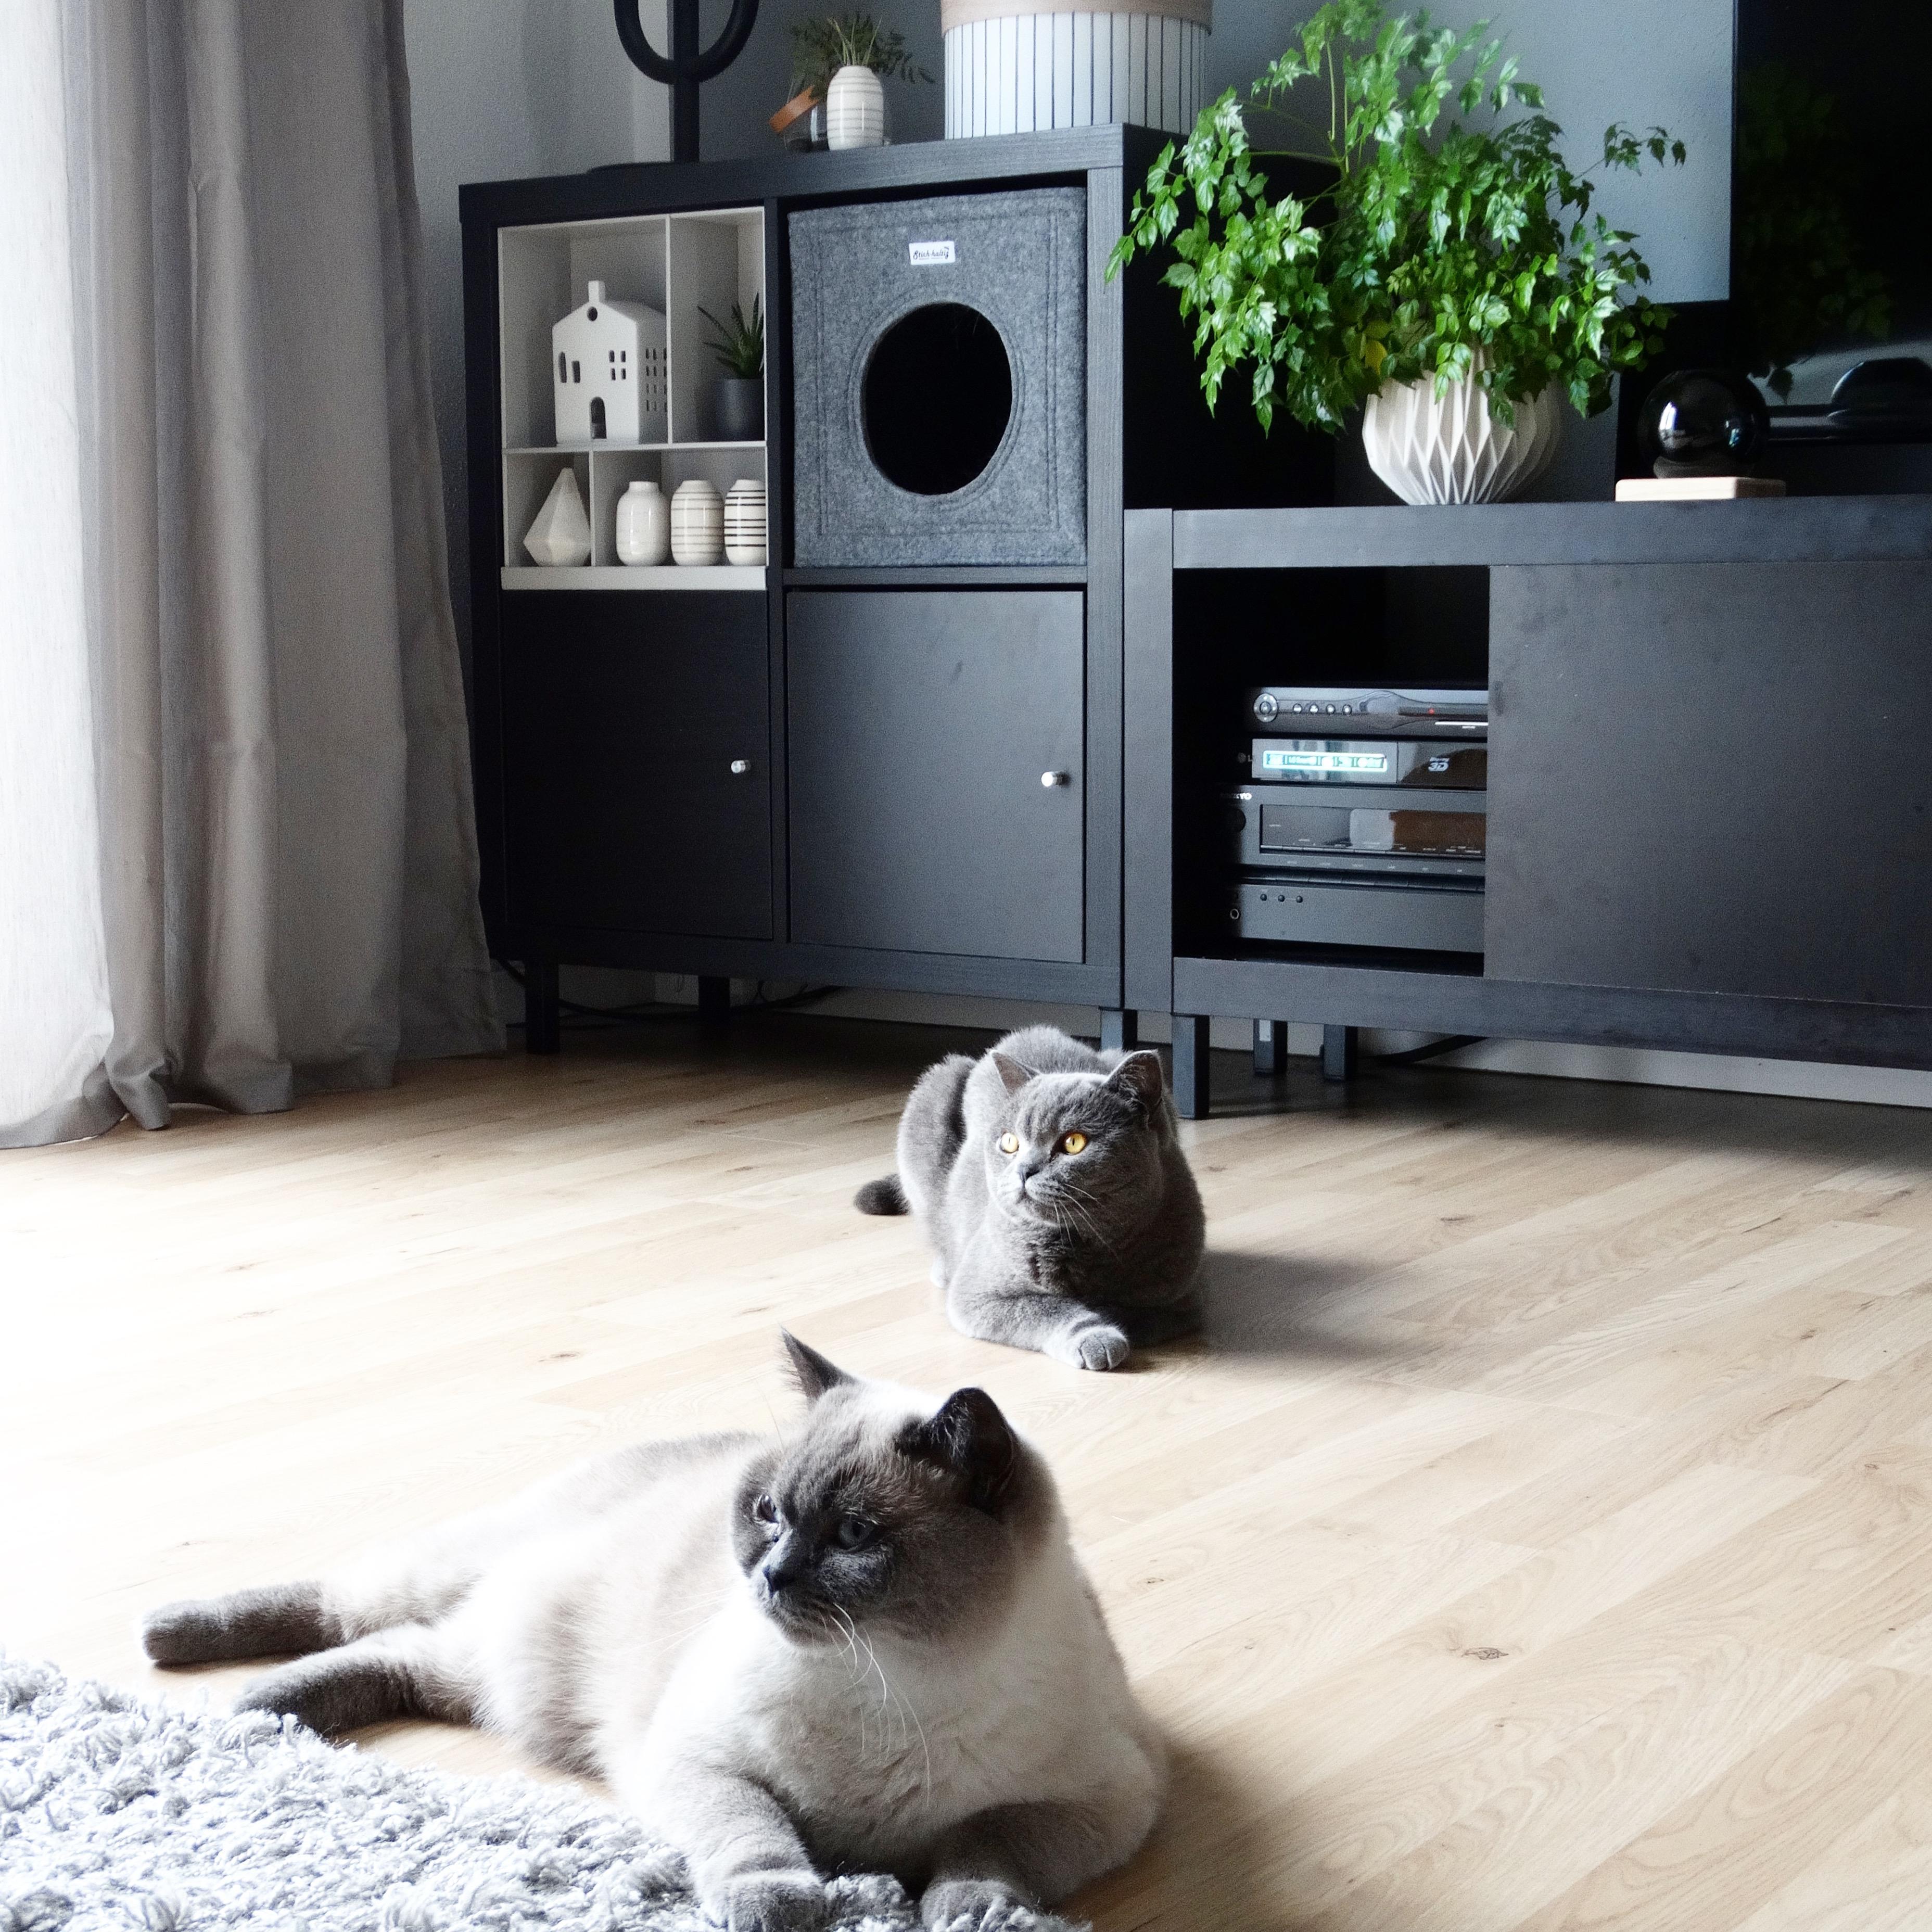 ikea expedit • bilder & ideen • couch